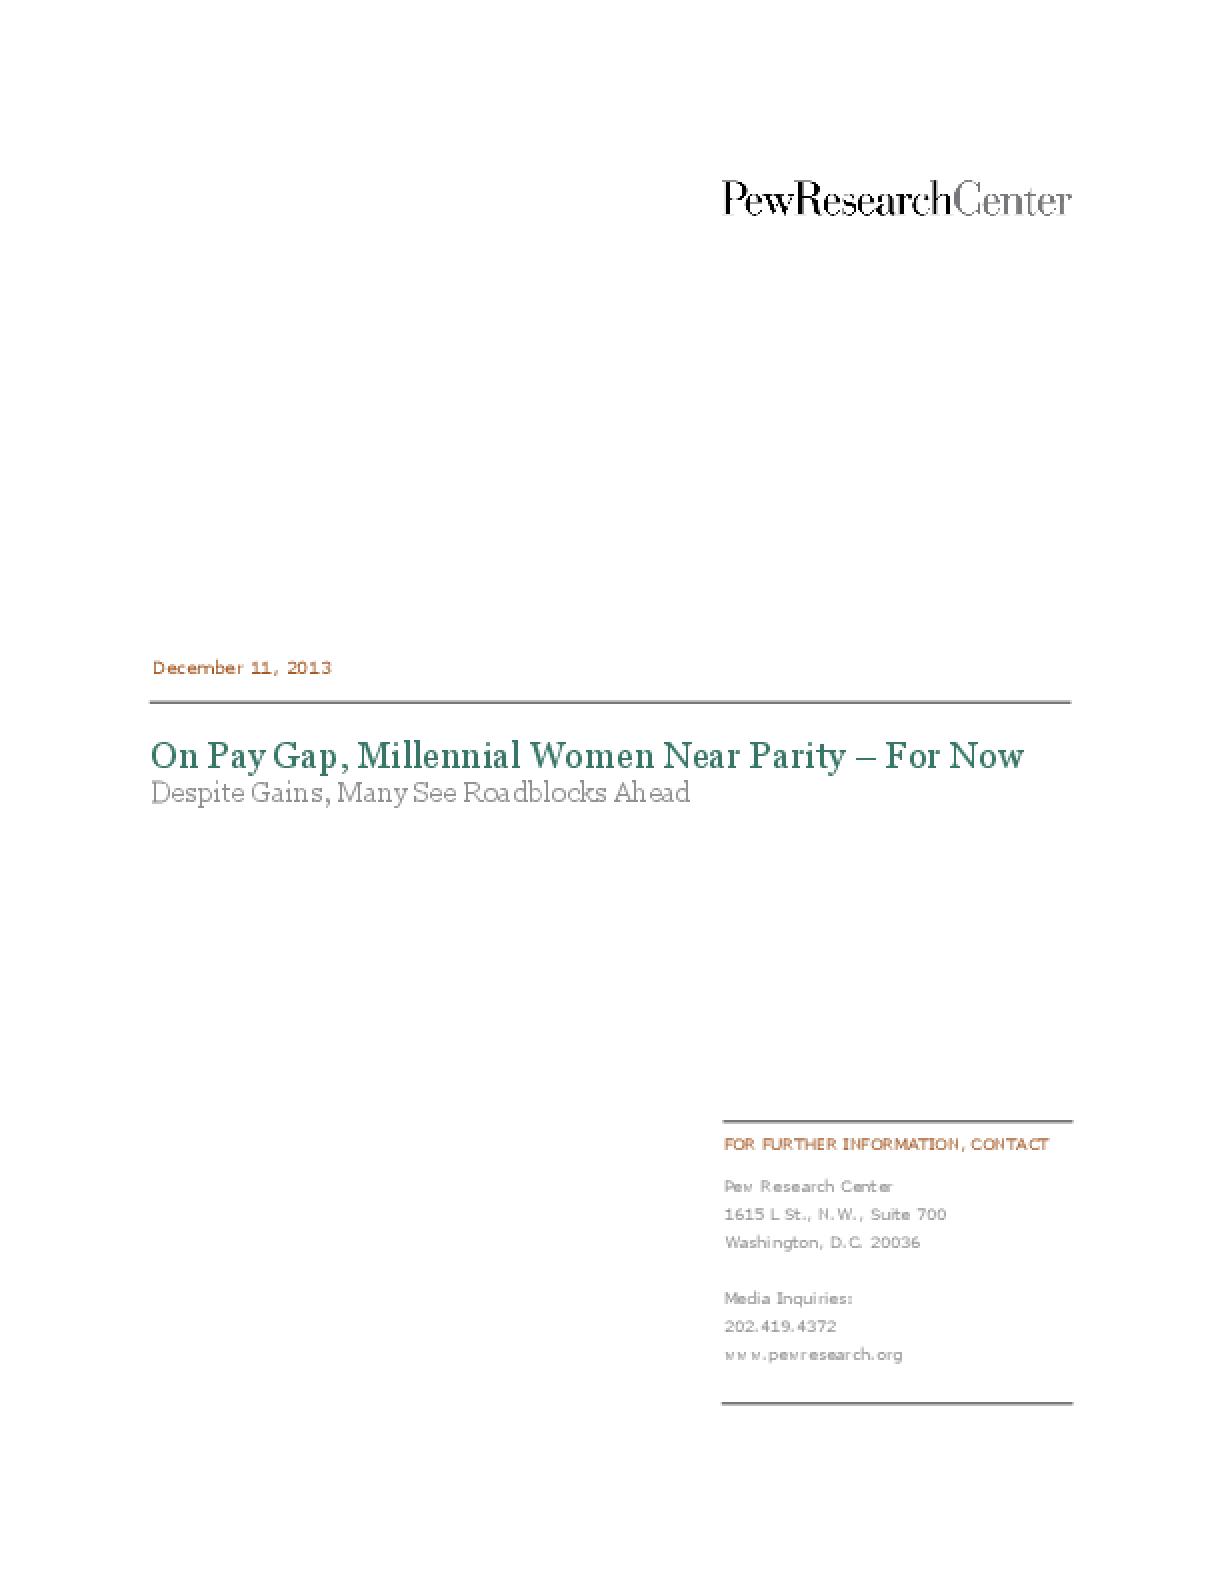 On Pay Gap, Millennial Women Near Parity - For Now